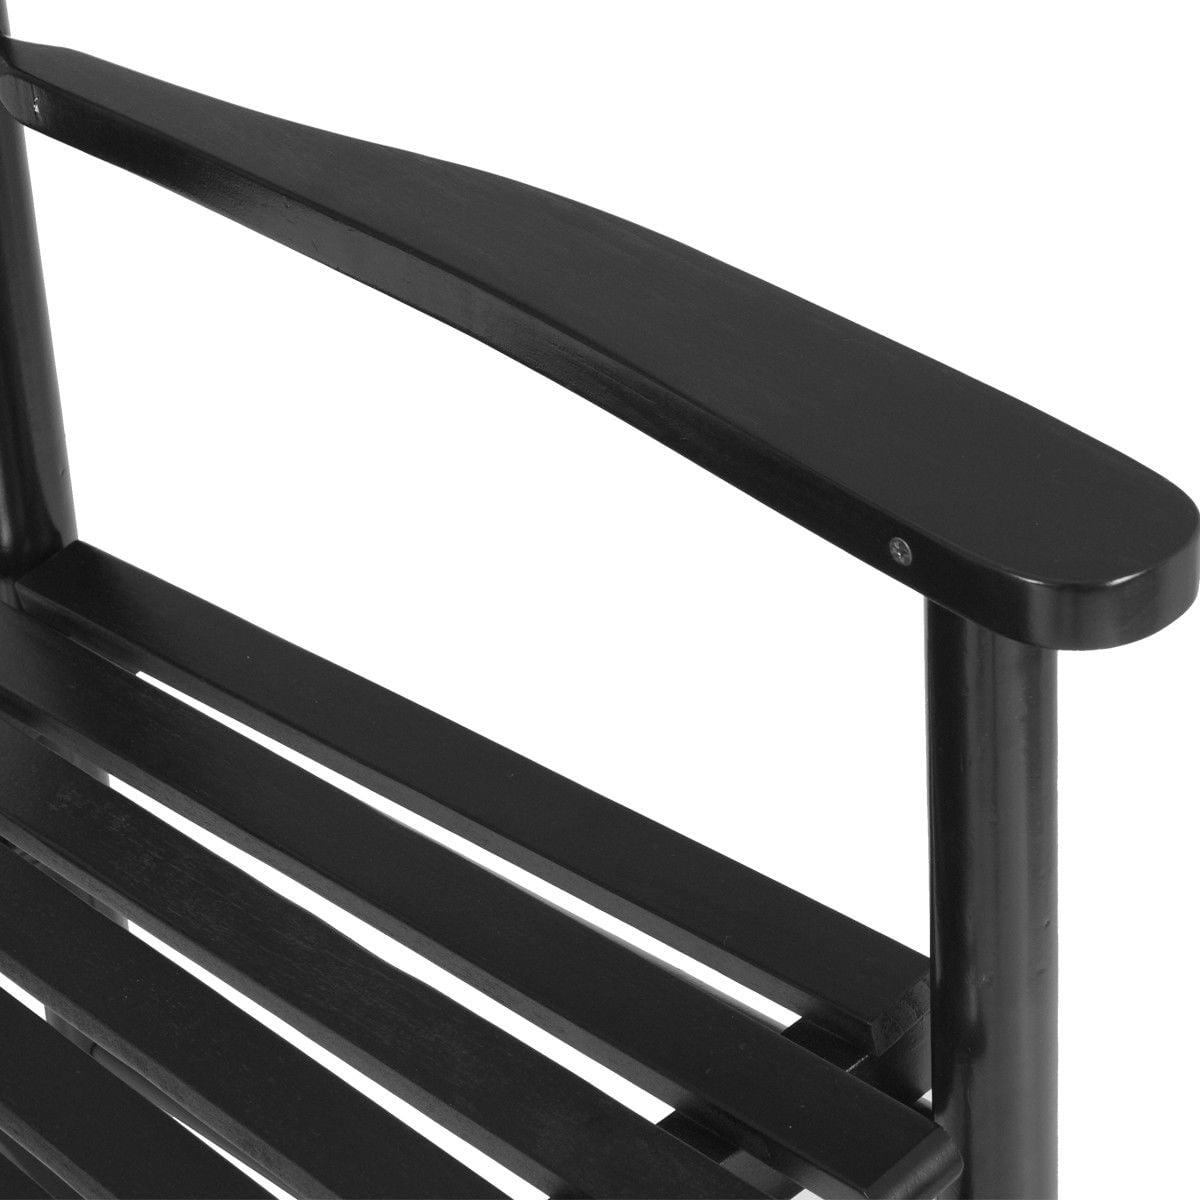 Gymax Wooden Rocking Chair Porch Rocker Armchair Balcony Deck Garden Furniture Black - image 5 of 8